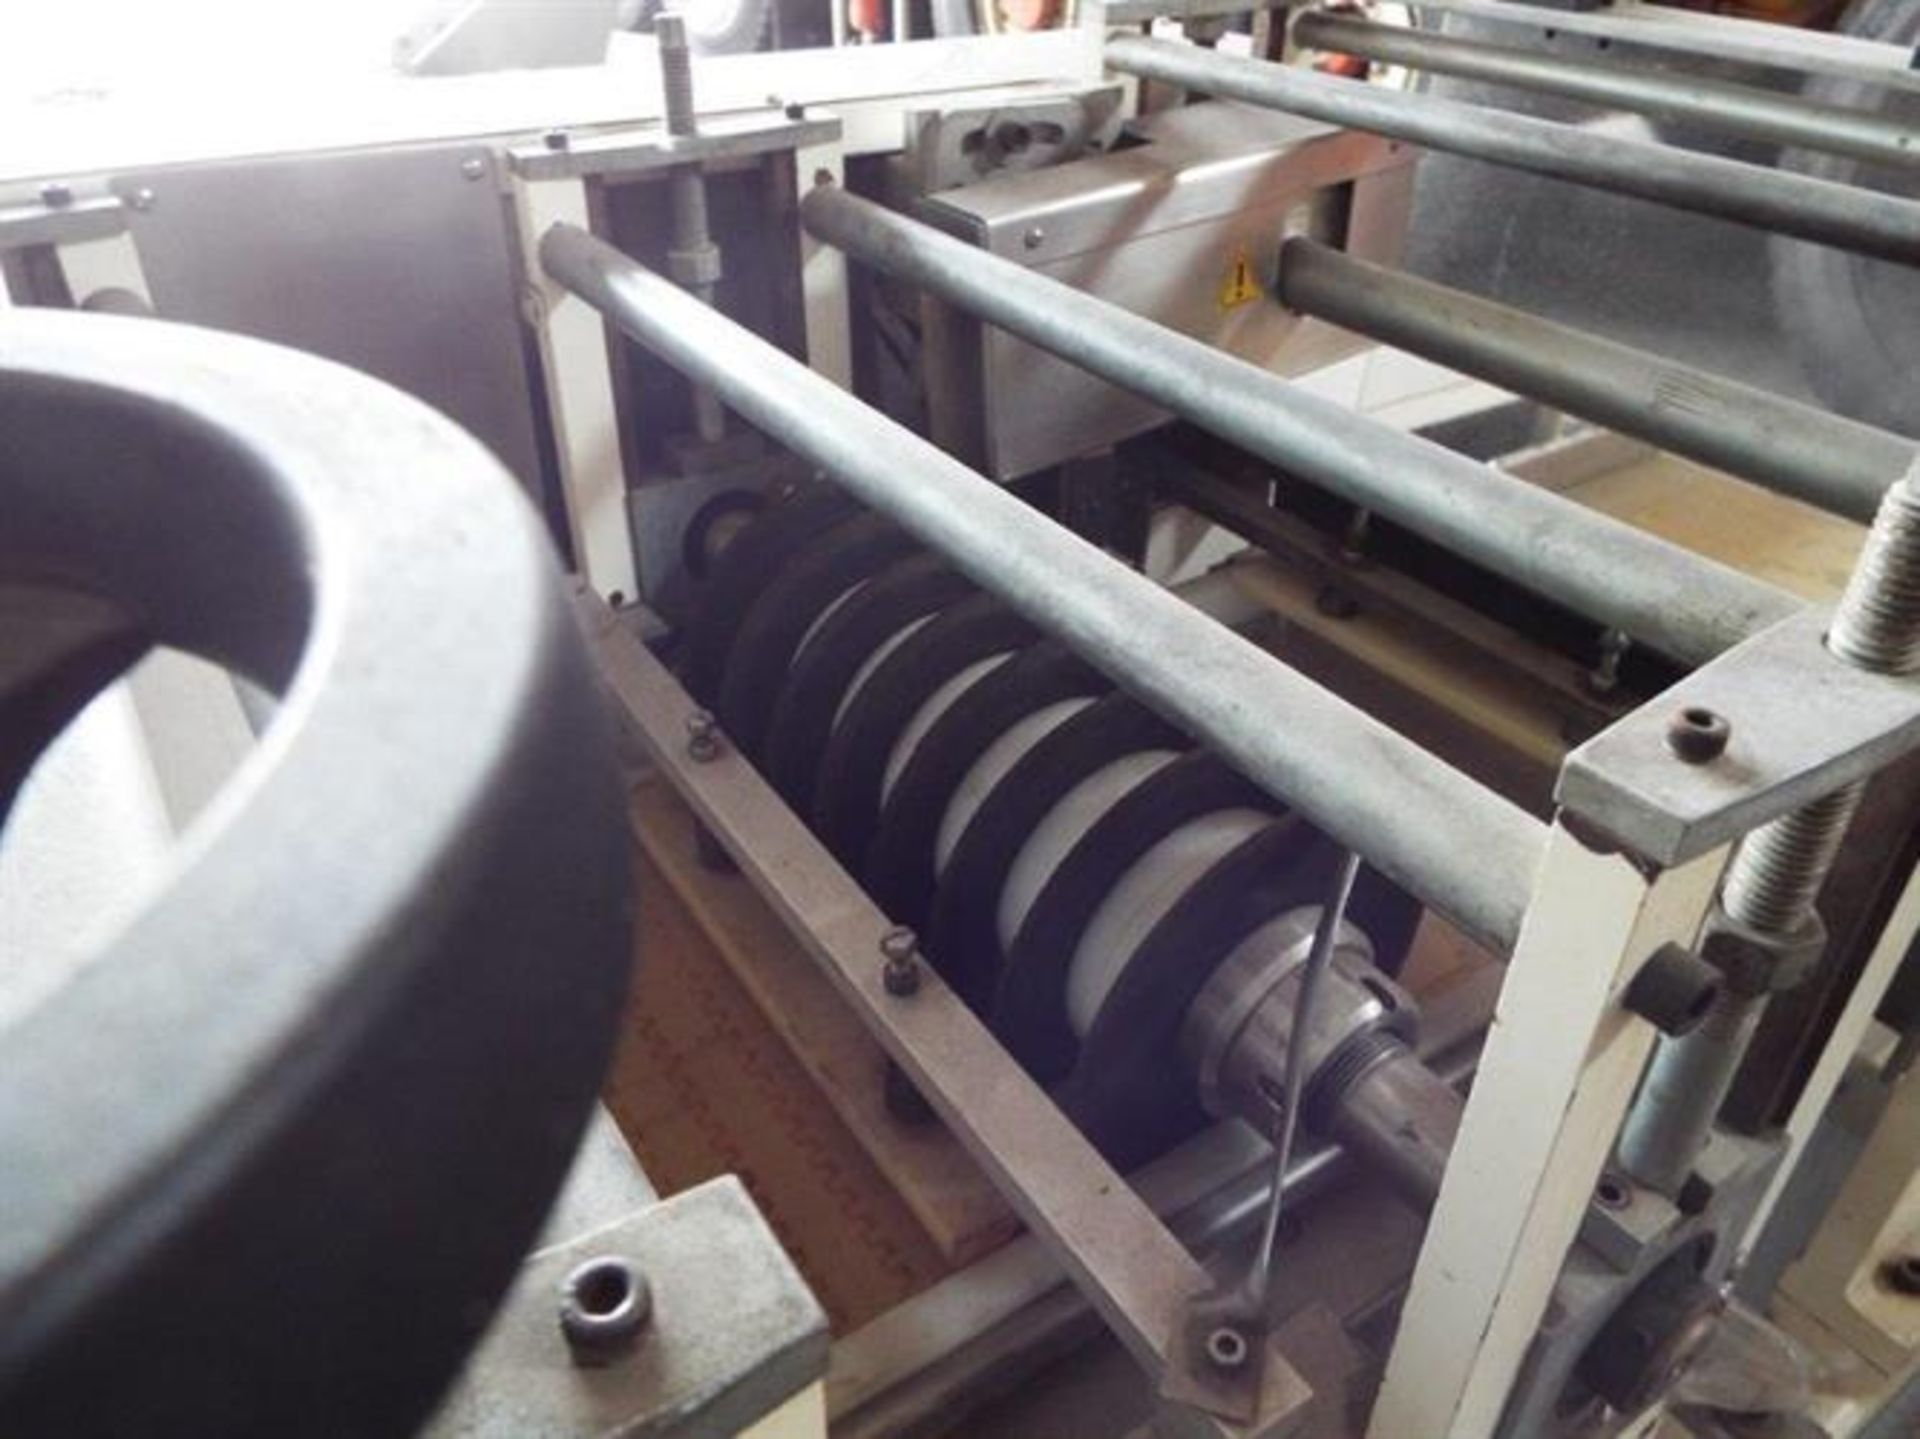 Tecmaq 290 mm Wide Slab Forming Line - Model TM-6H built 2012 - Three sets of gauging/sheeting - Image 18 of 30